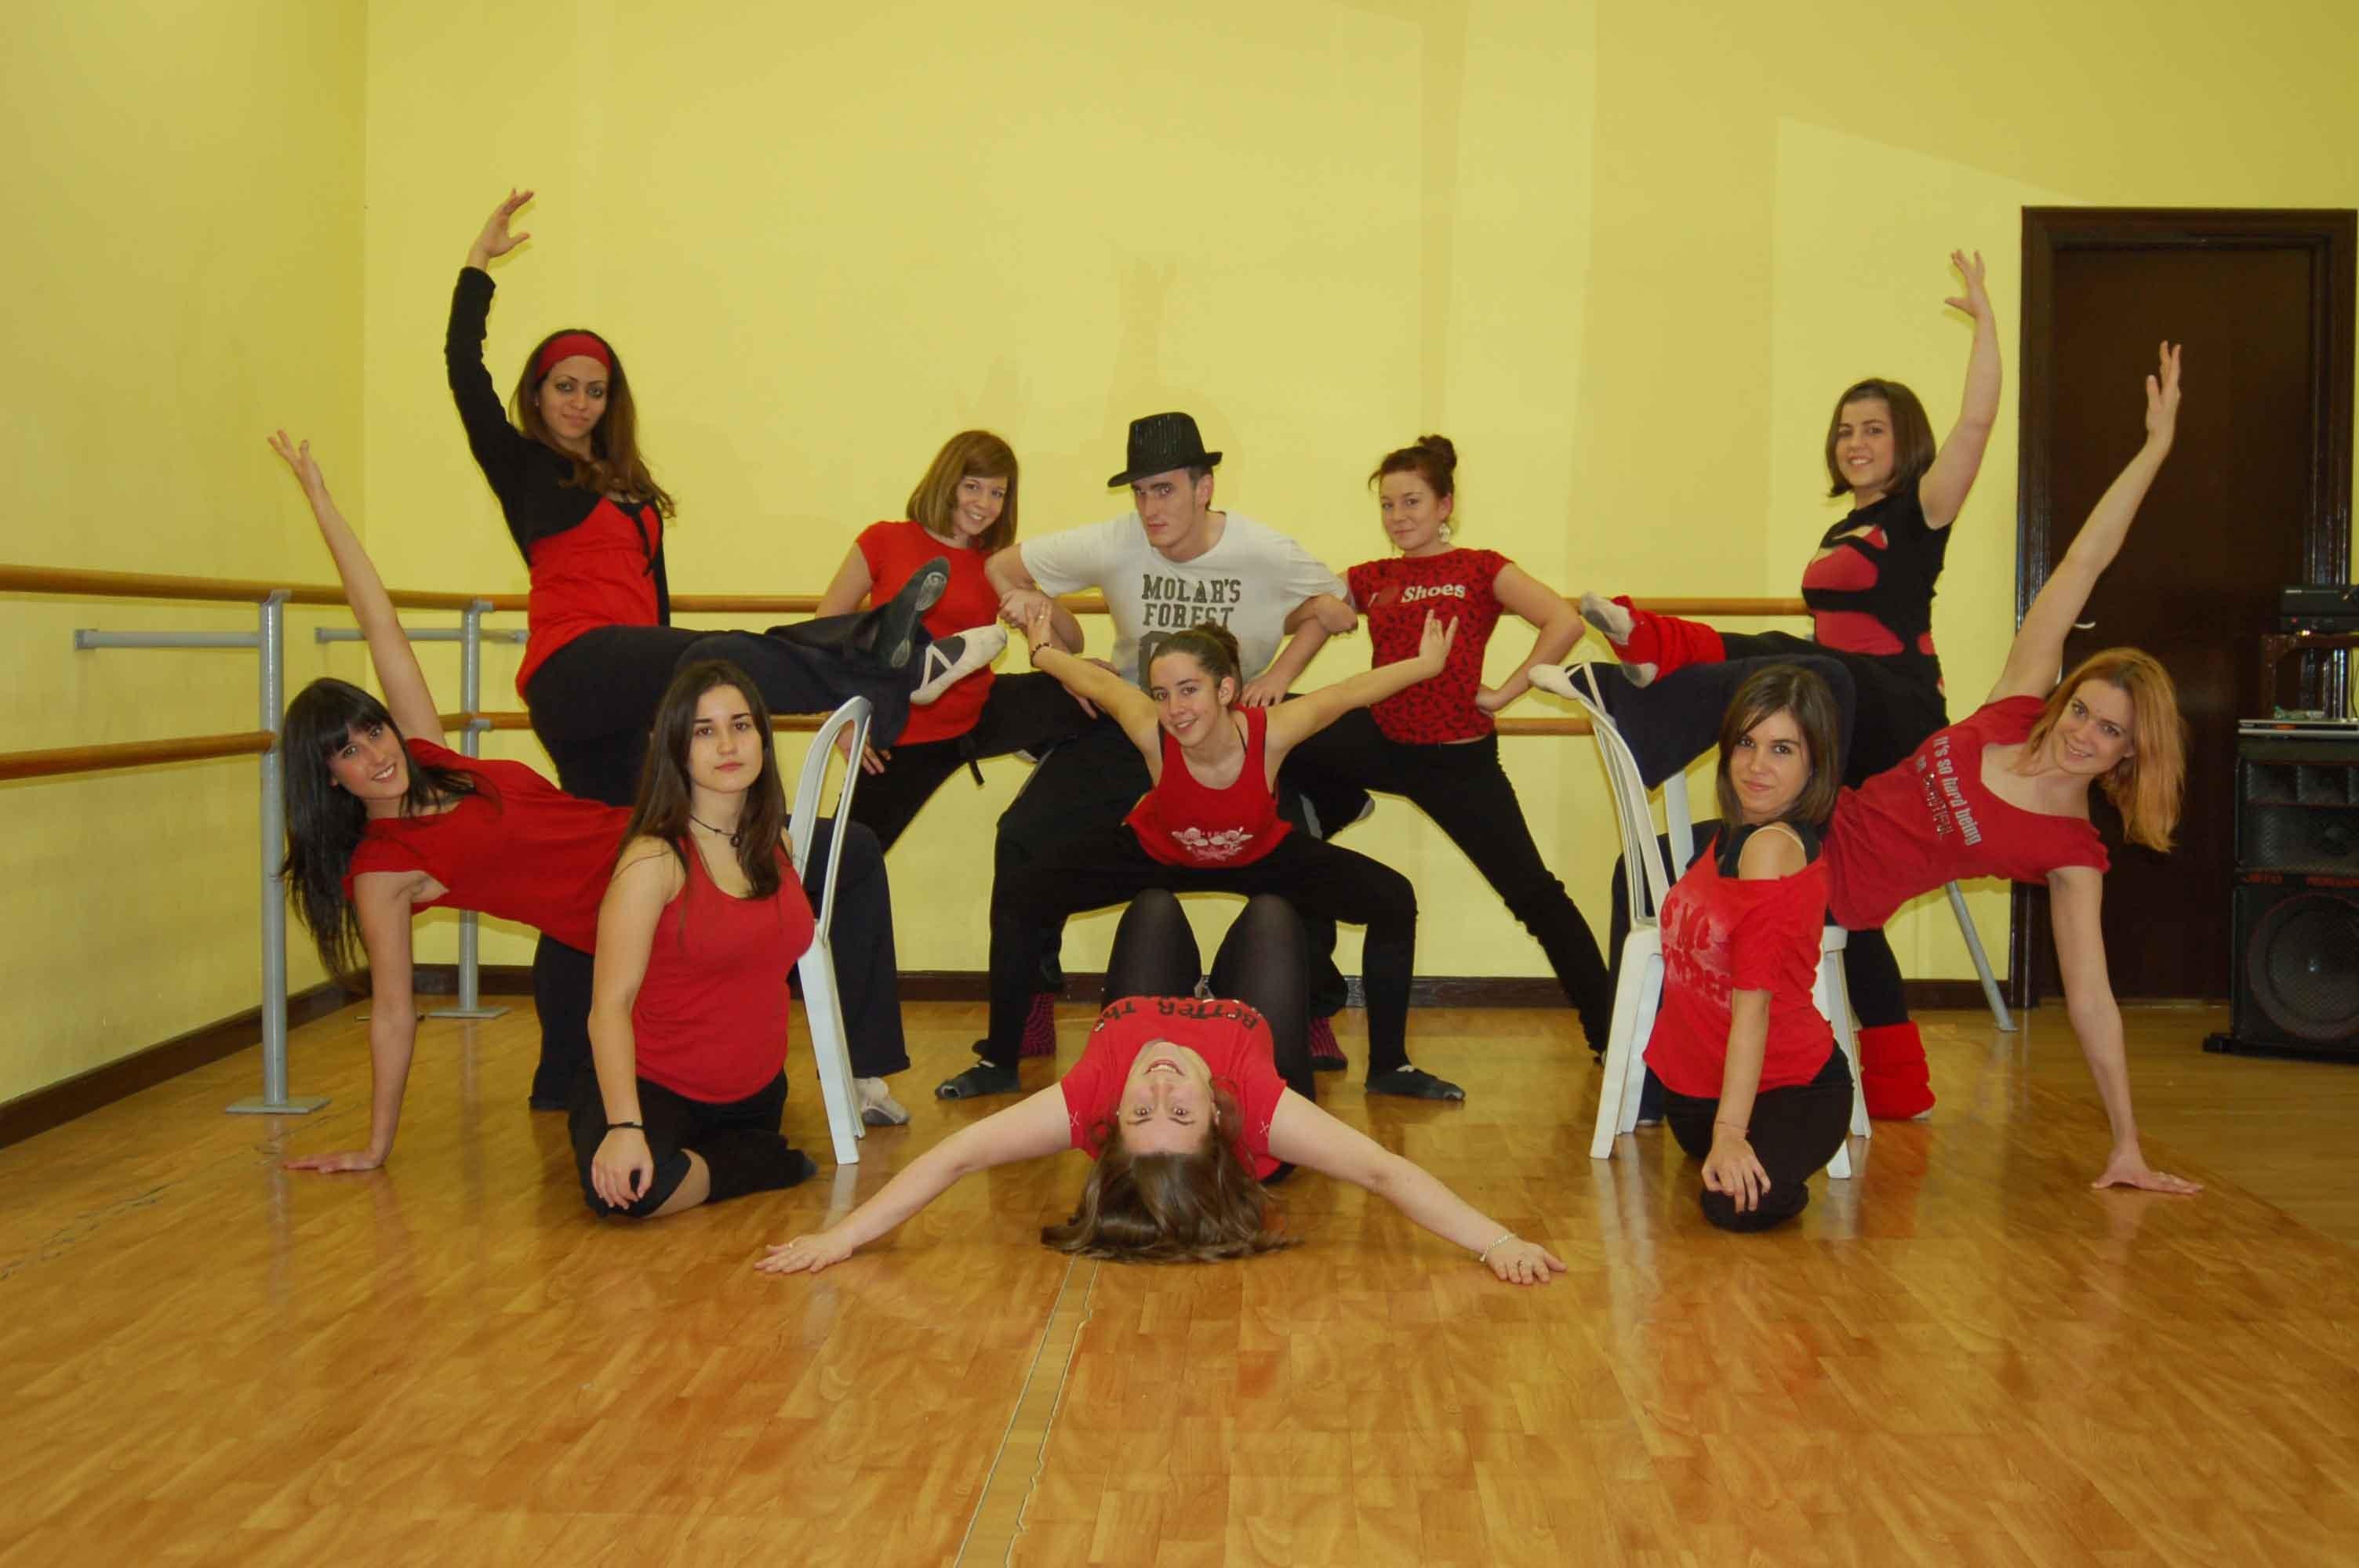 Academia de ballet en latex - 3 part 4